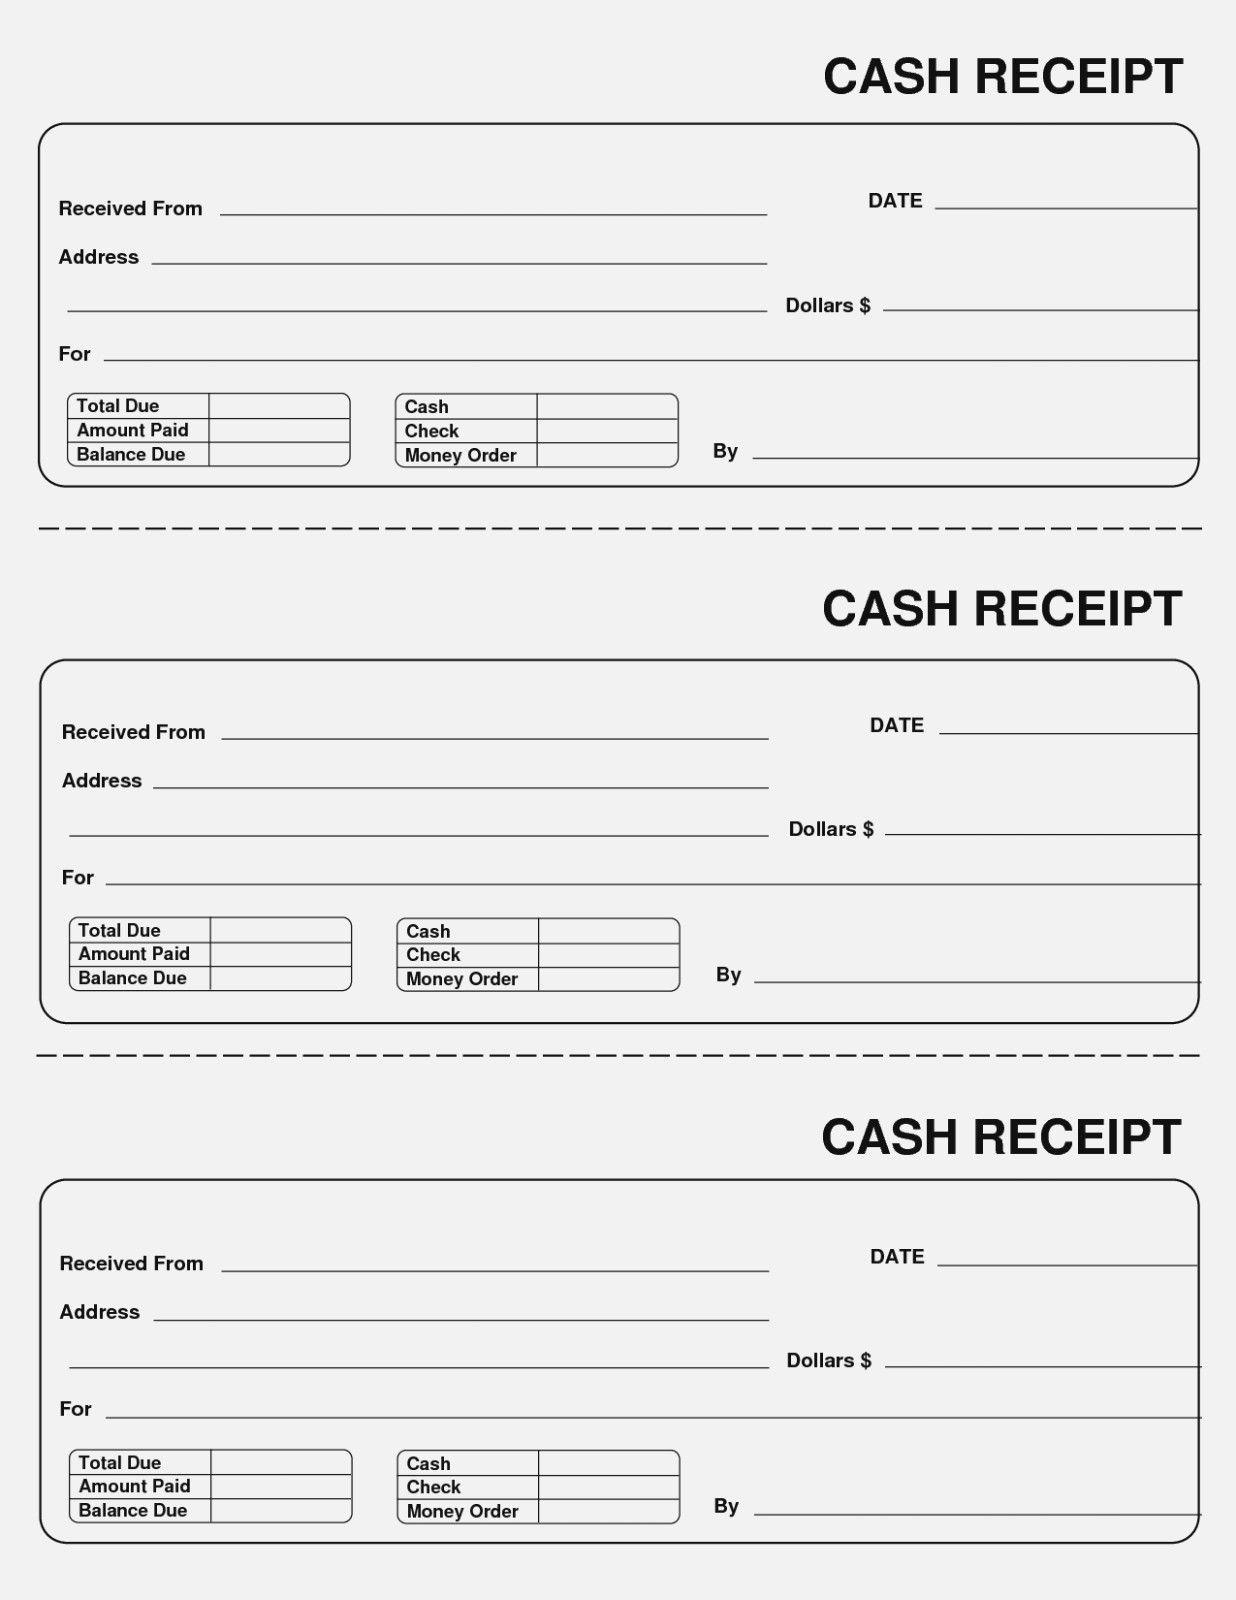 Unique Free Receipt Xls Xlsformat Xlstemplates Xlstemplate Check More At Https Mavensocial Co Free Receipt